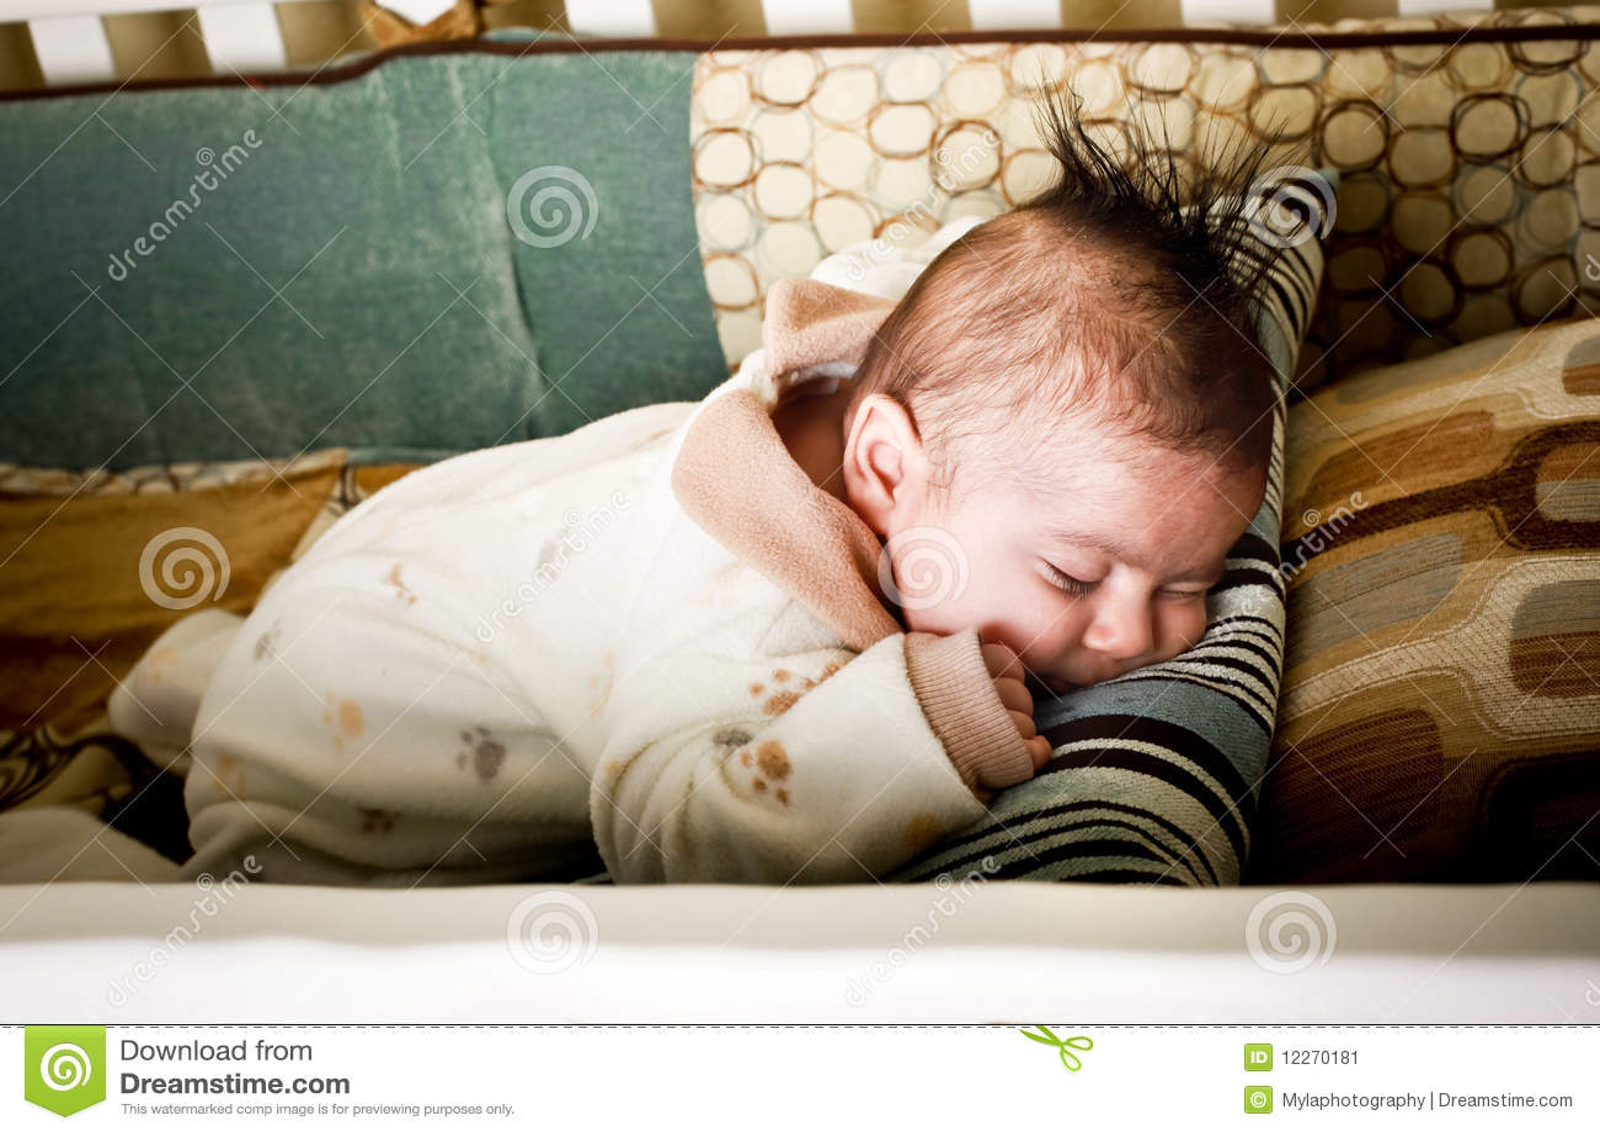 Asleep On Tummy Stock Image Image Of Sleep Holding